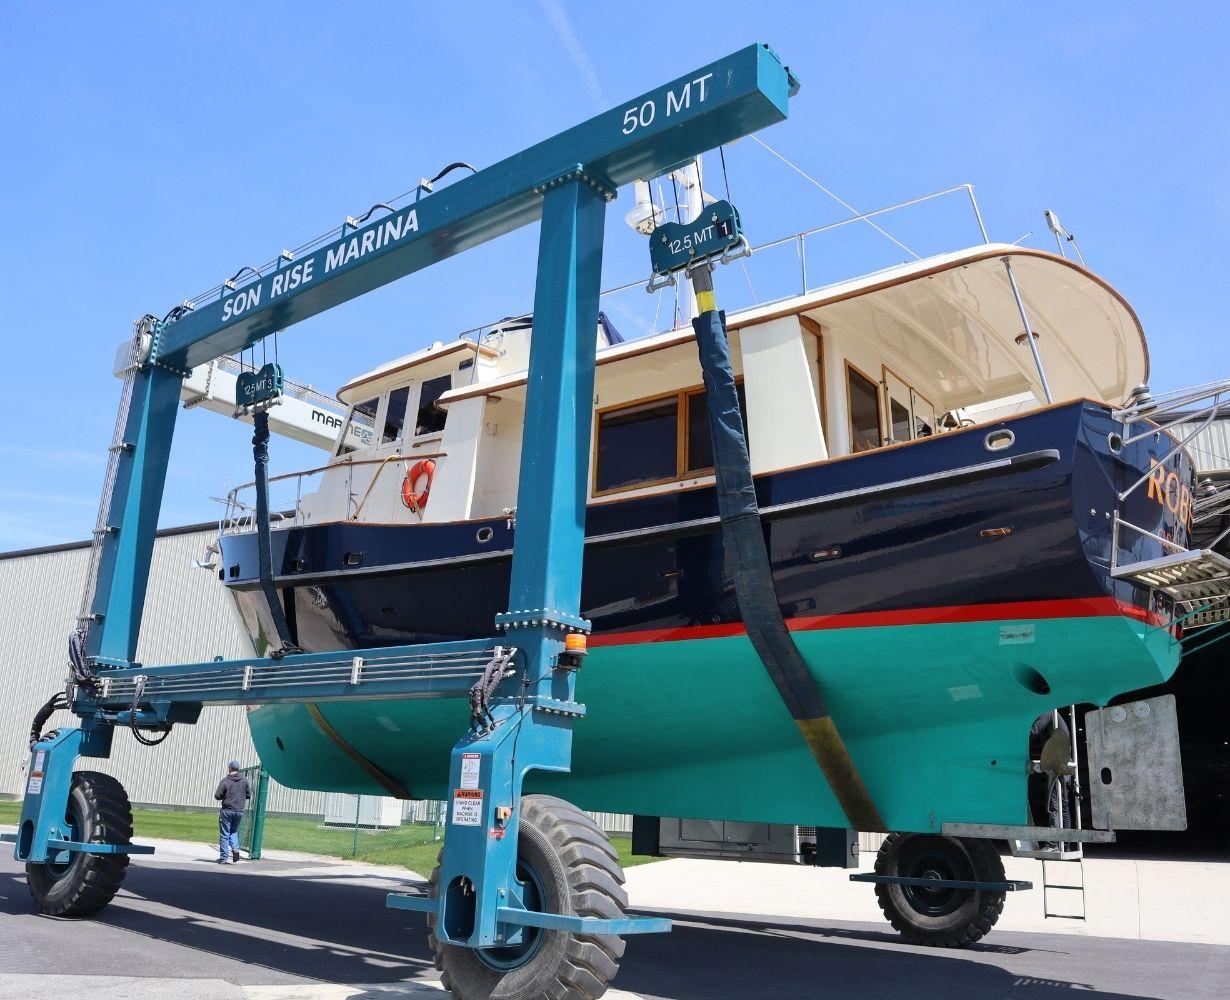 son-rise-marina-sandusky-ohio-gallery-boat-4